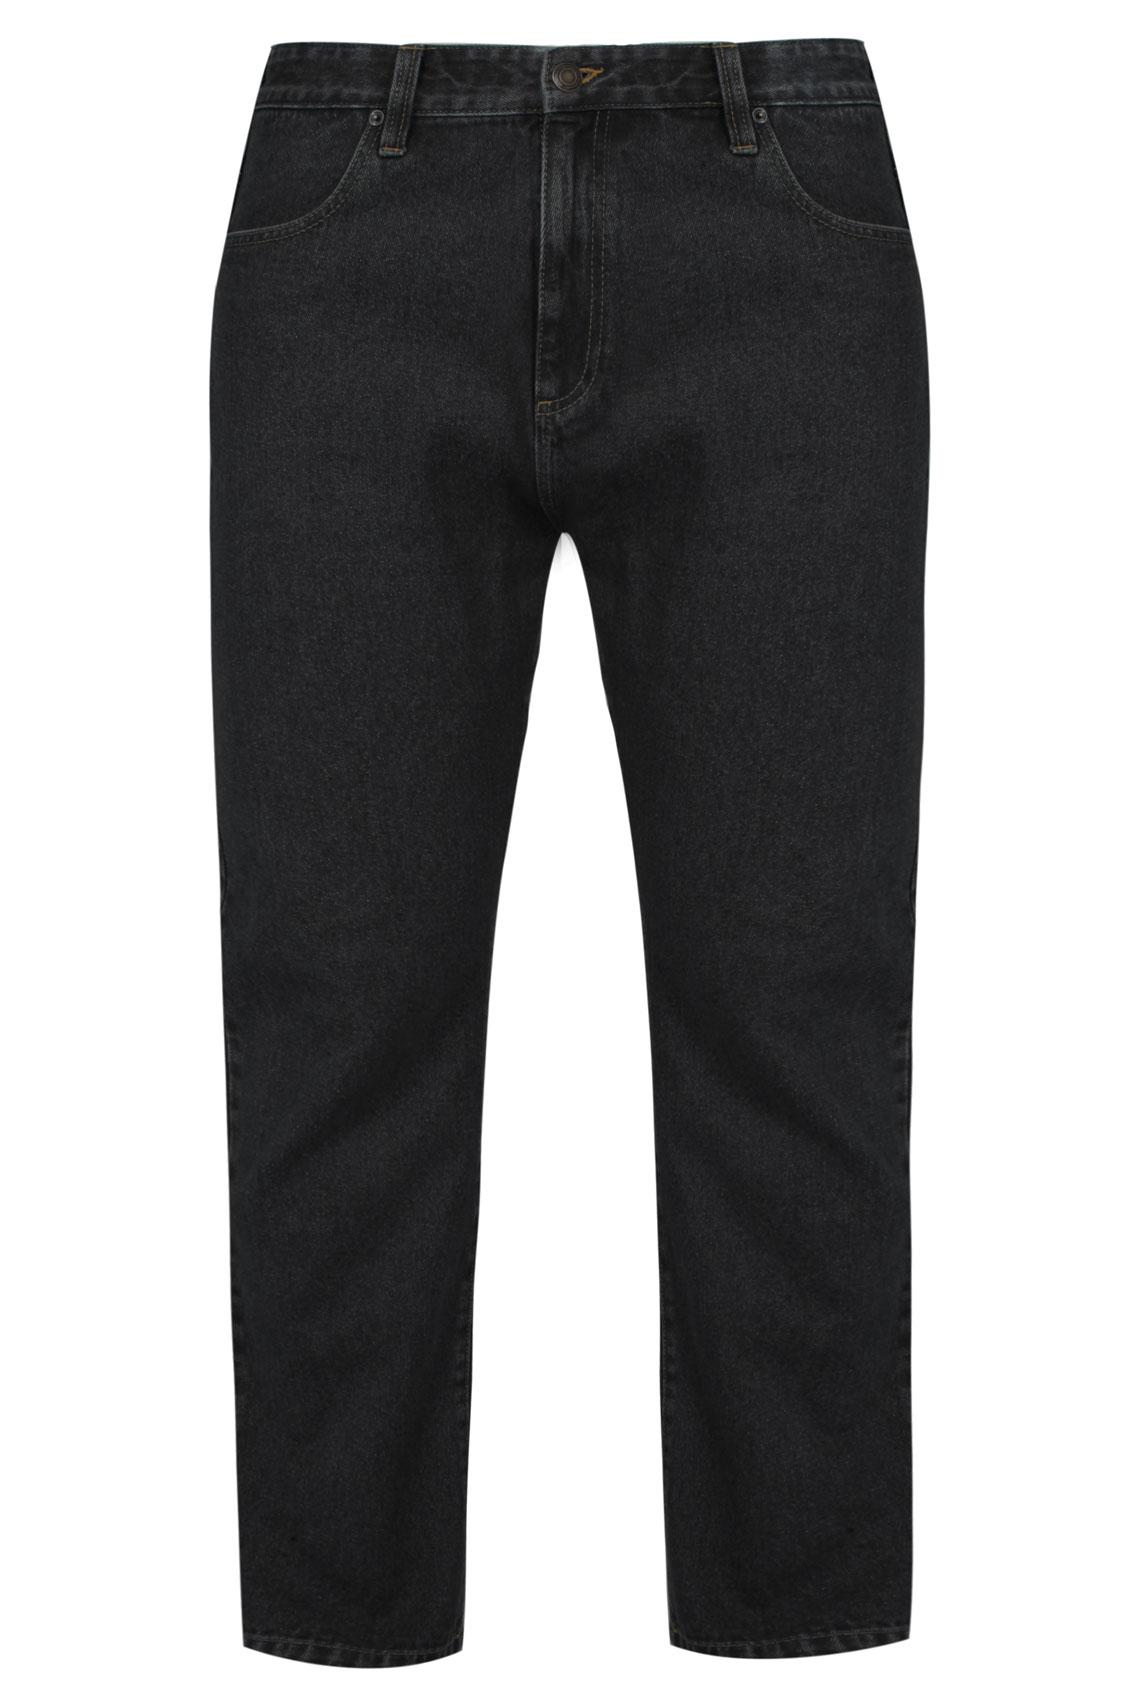 BadRhino Black Denim Stretch Straight Leg Jeans